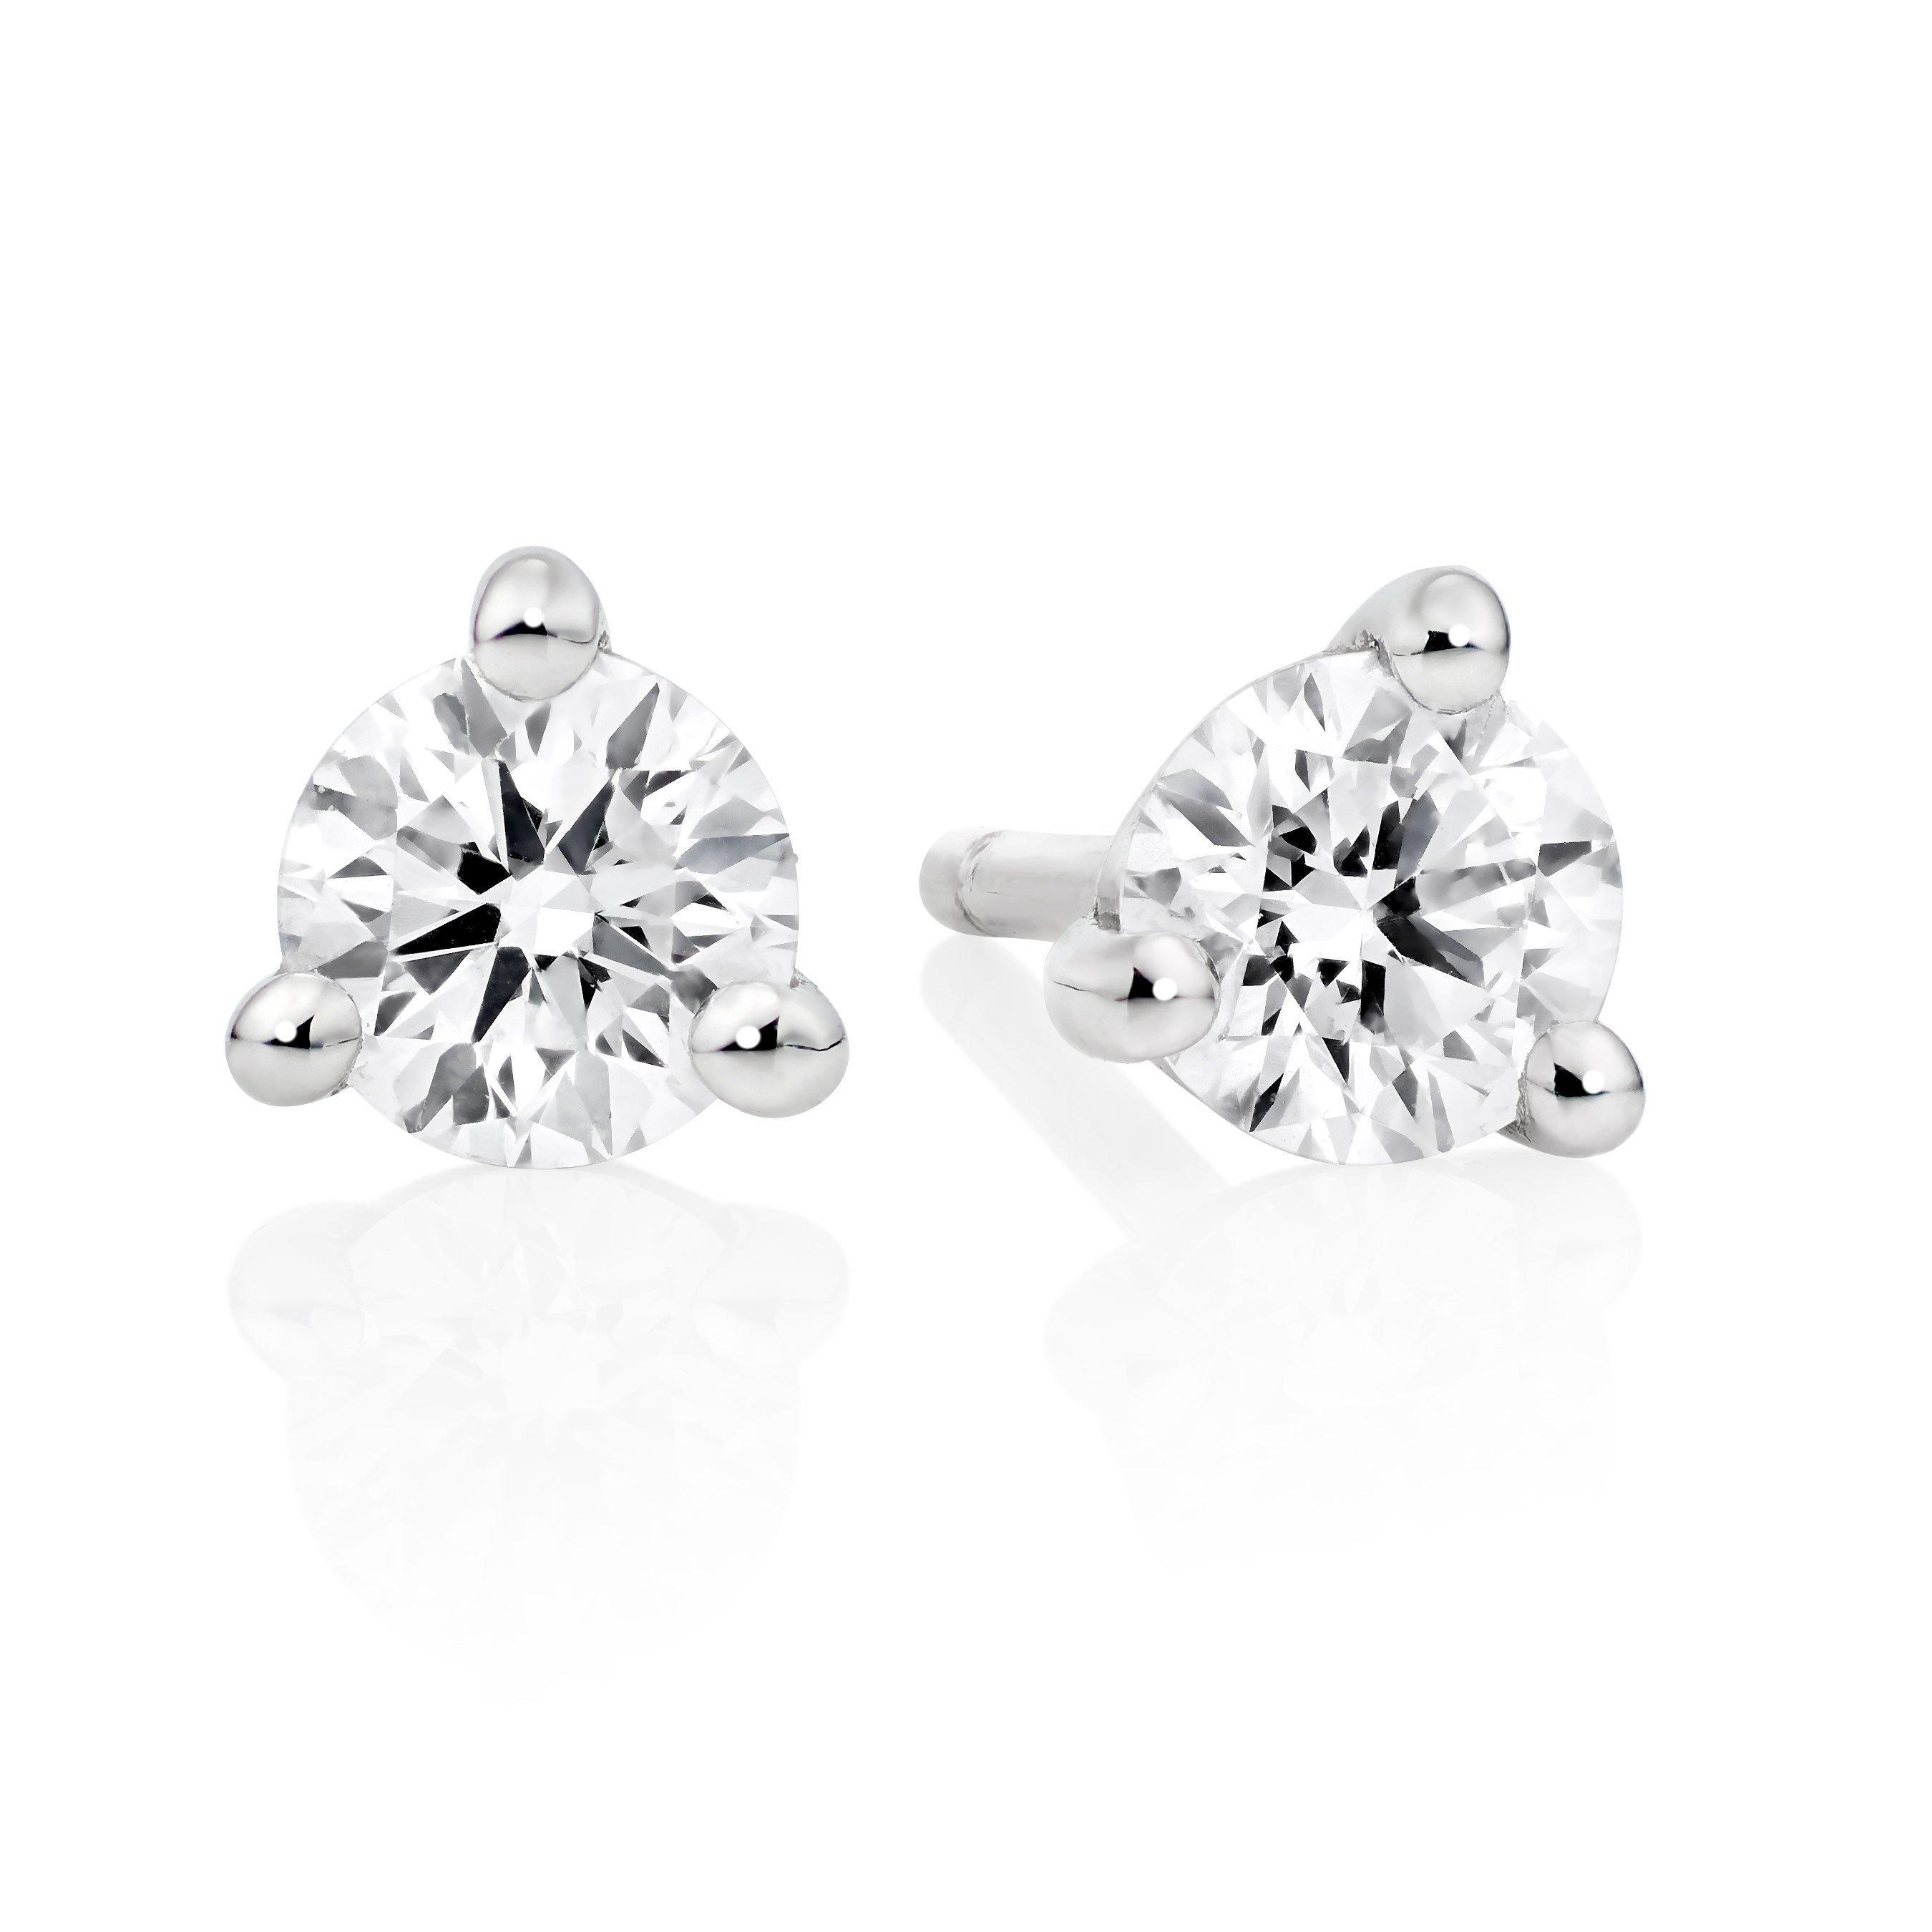 Hearts On Fire 18ct White Gold Diamond Earrings